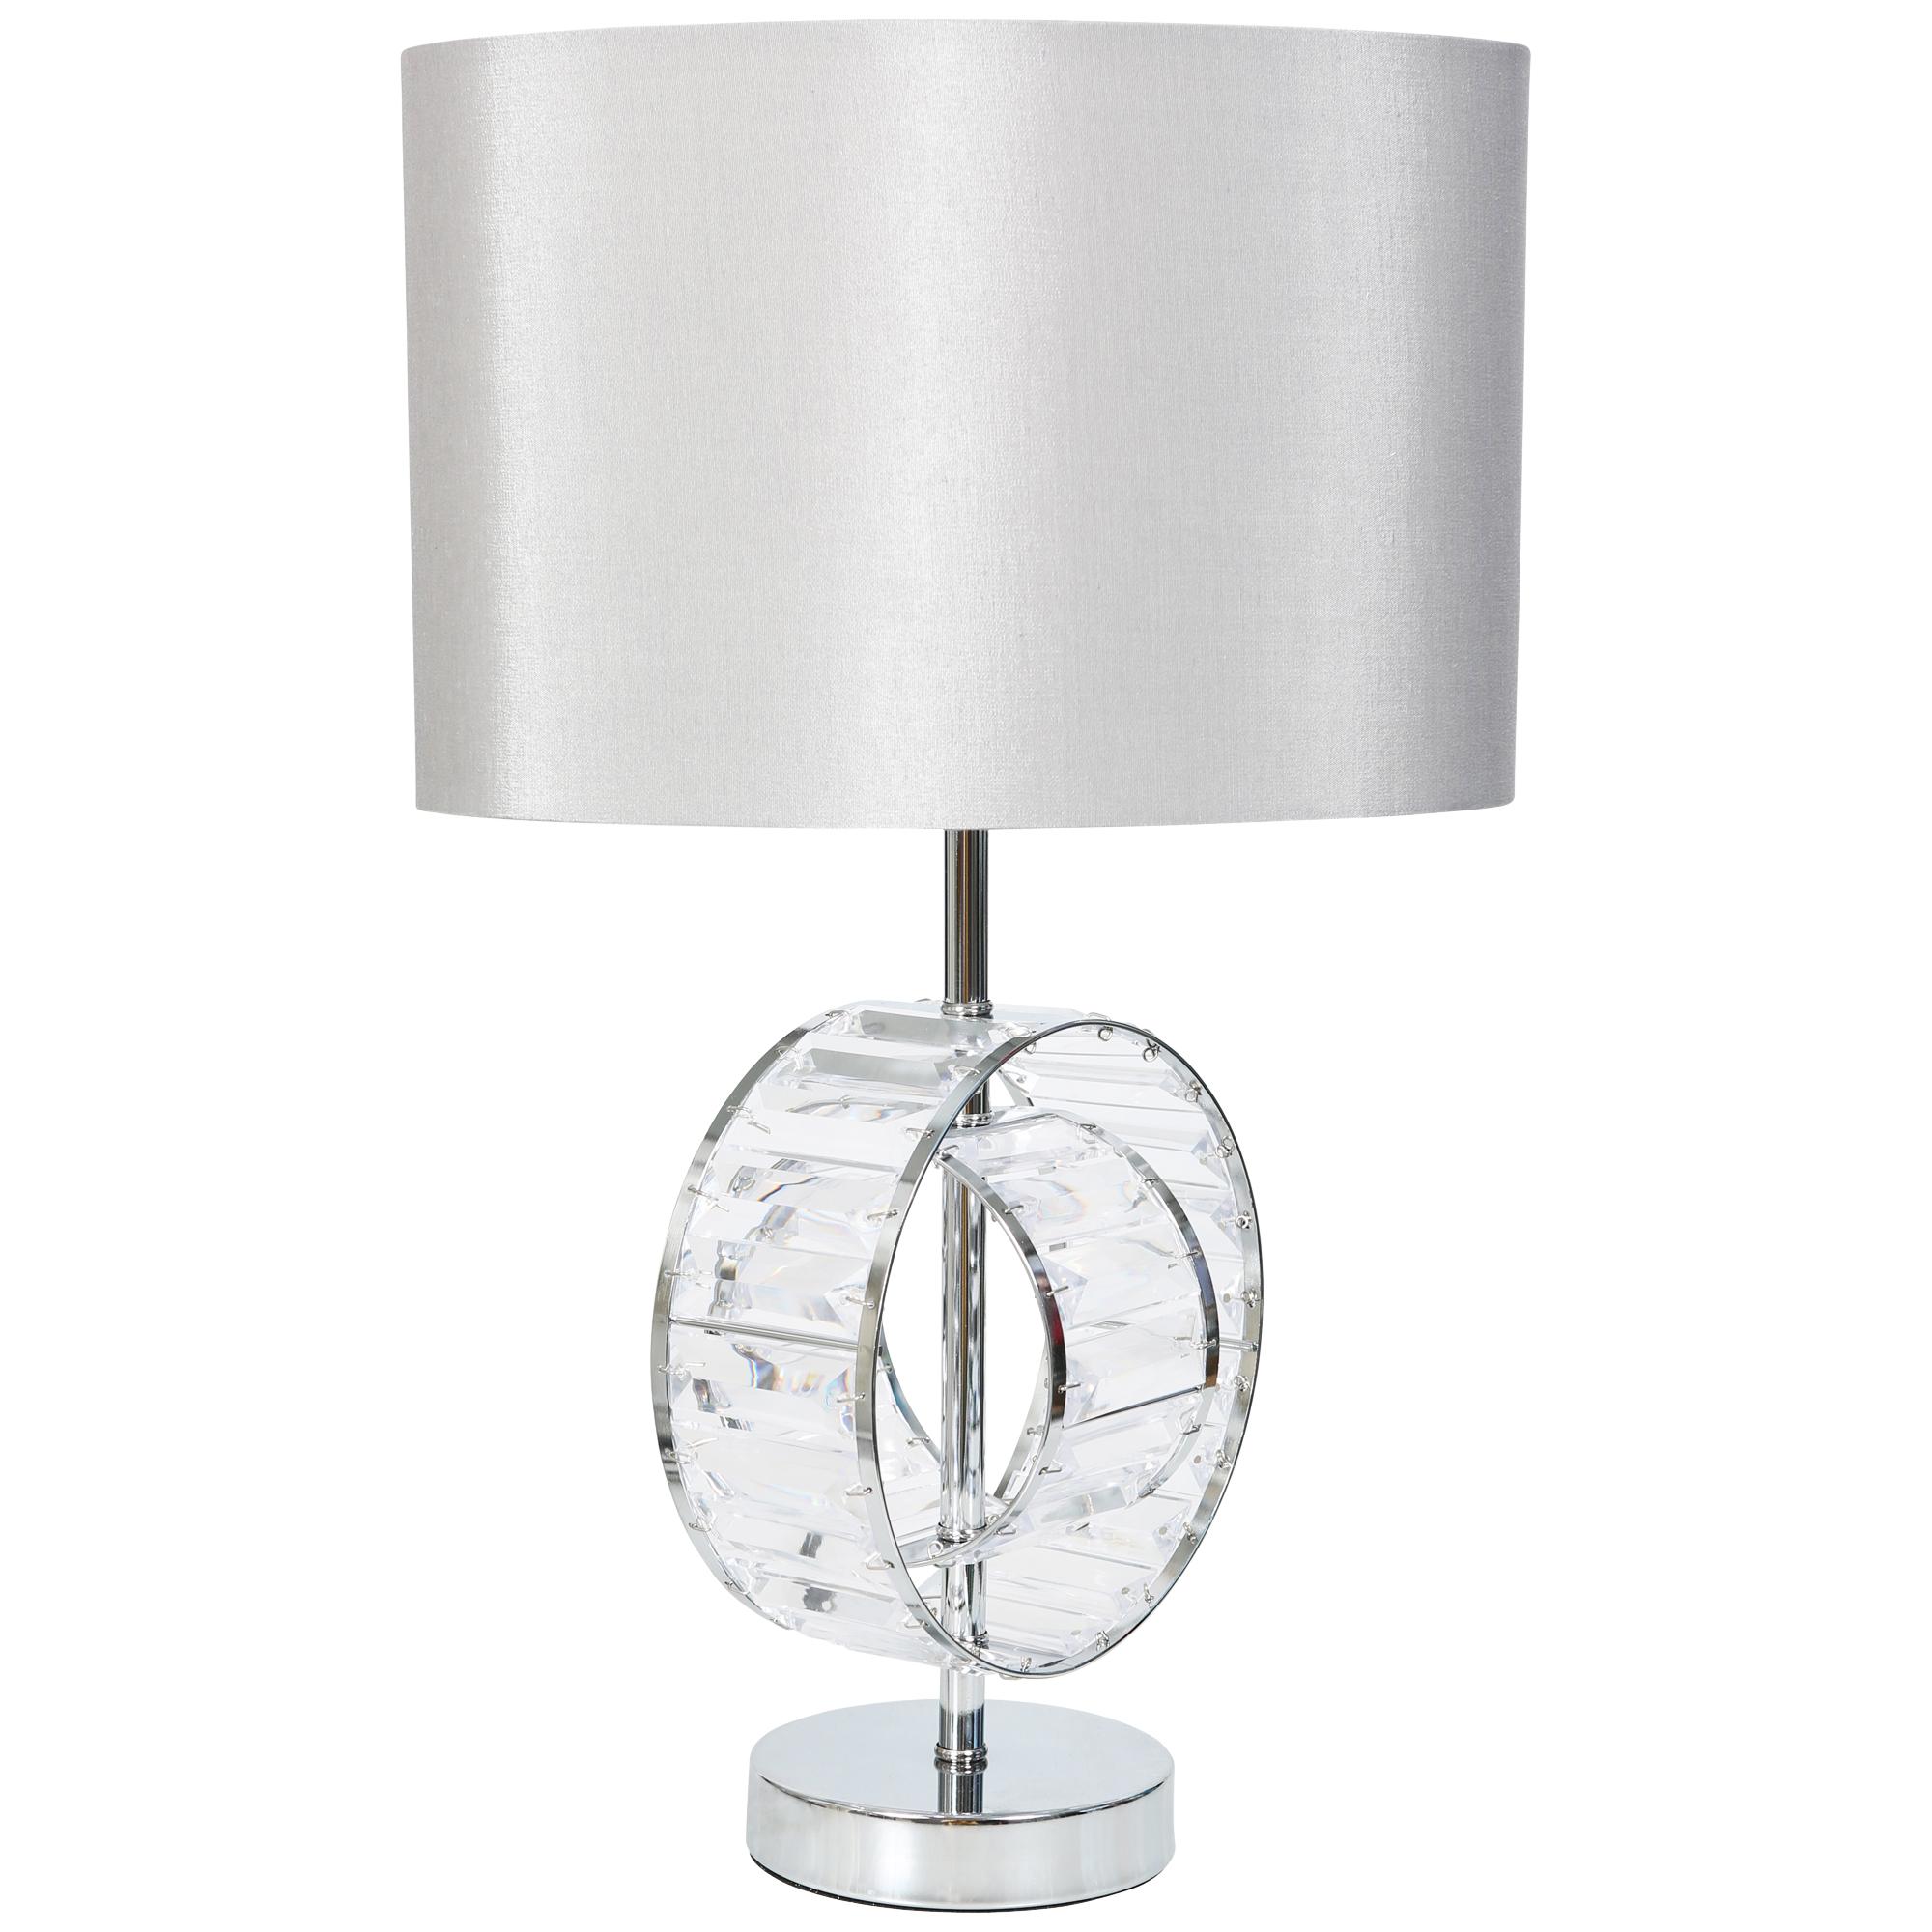 Kliving Brompton Chrome Acrylic Modern Table Lamp With